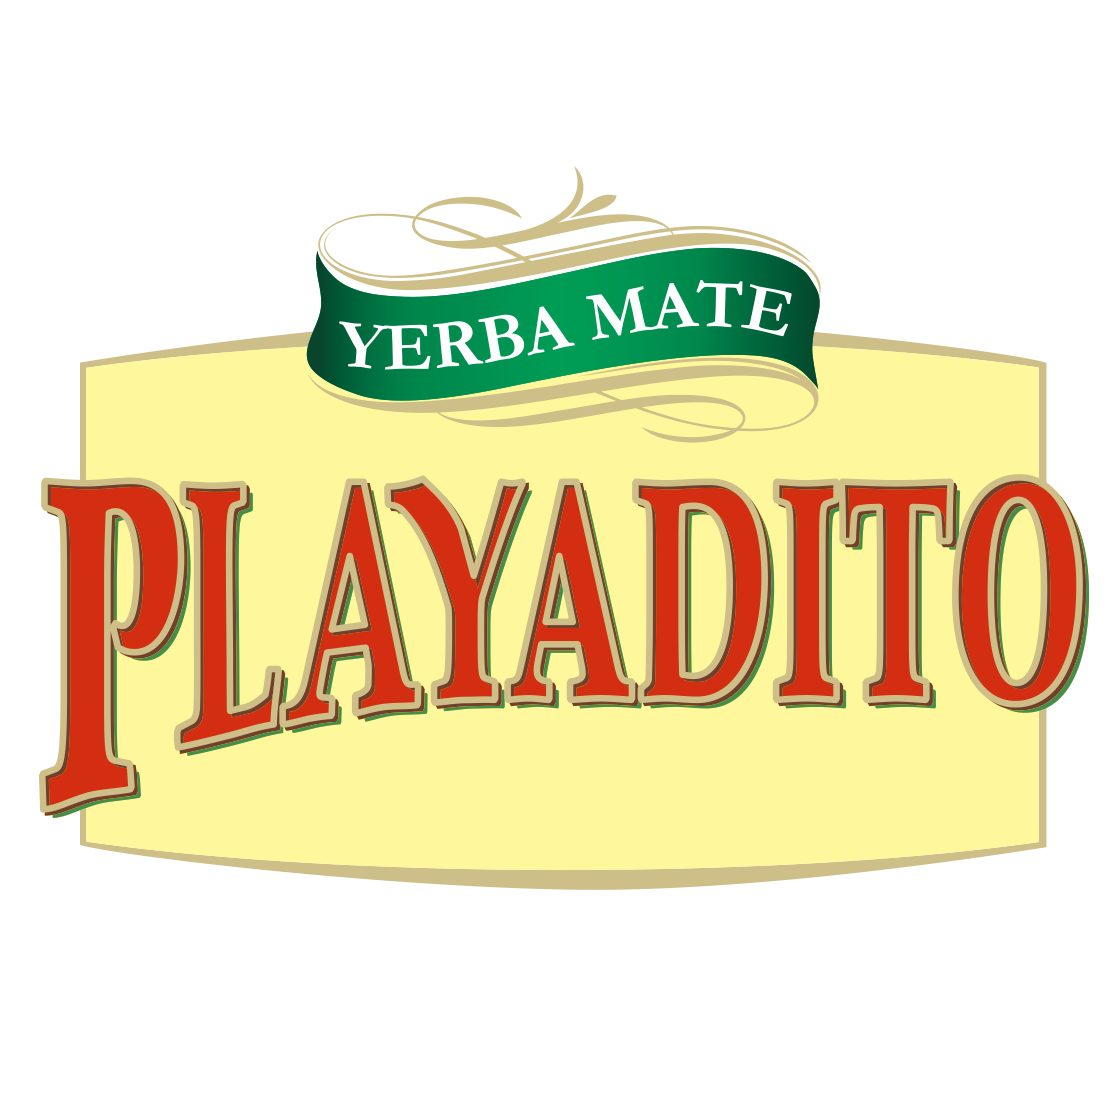 Yerba Mate Playadito